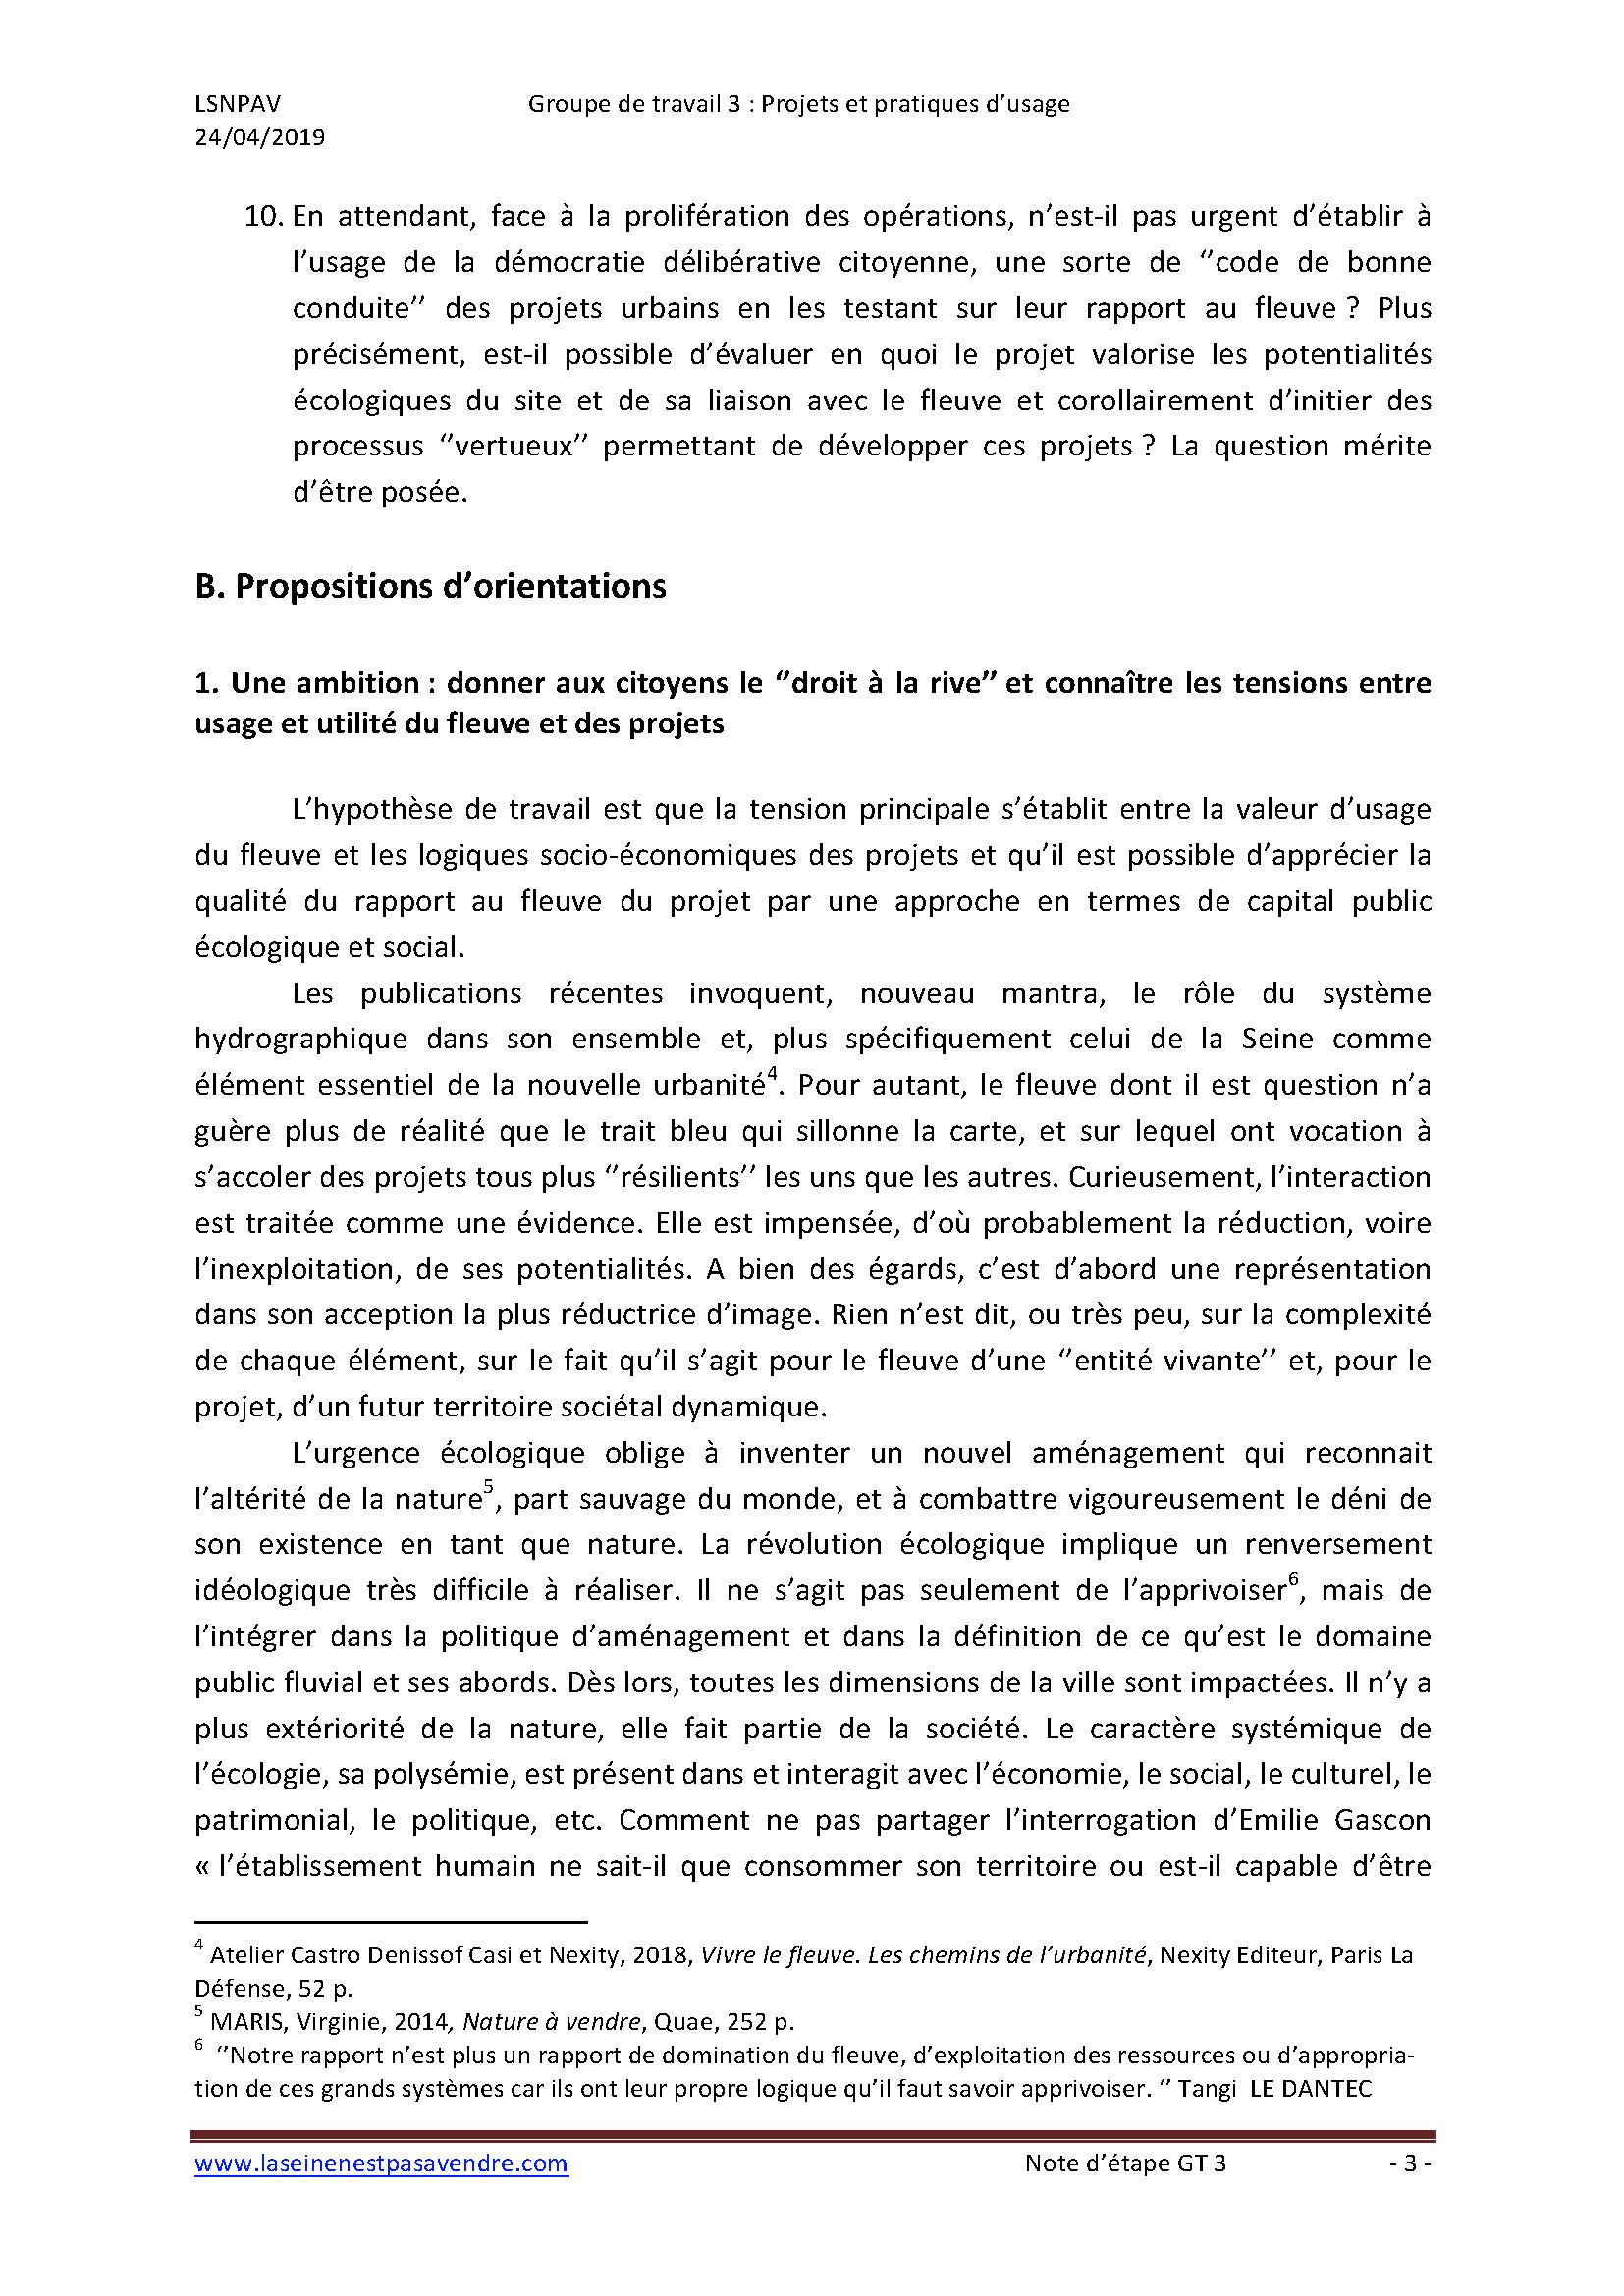 GT 3 Note d'étape_Page_03.jpg